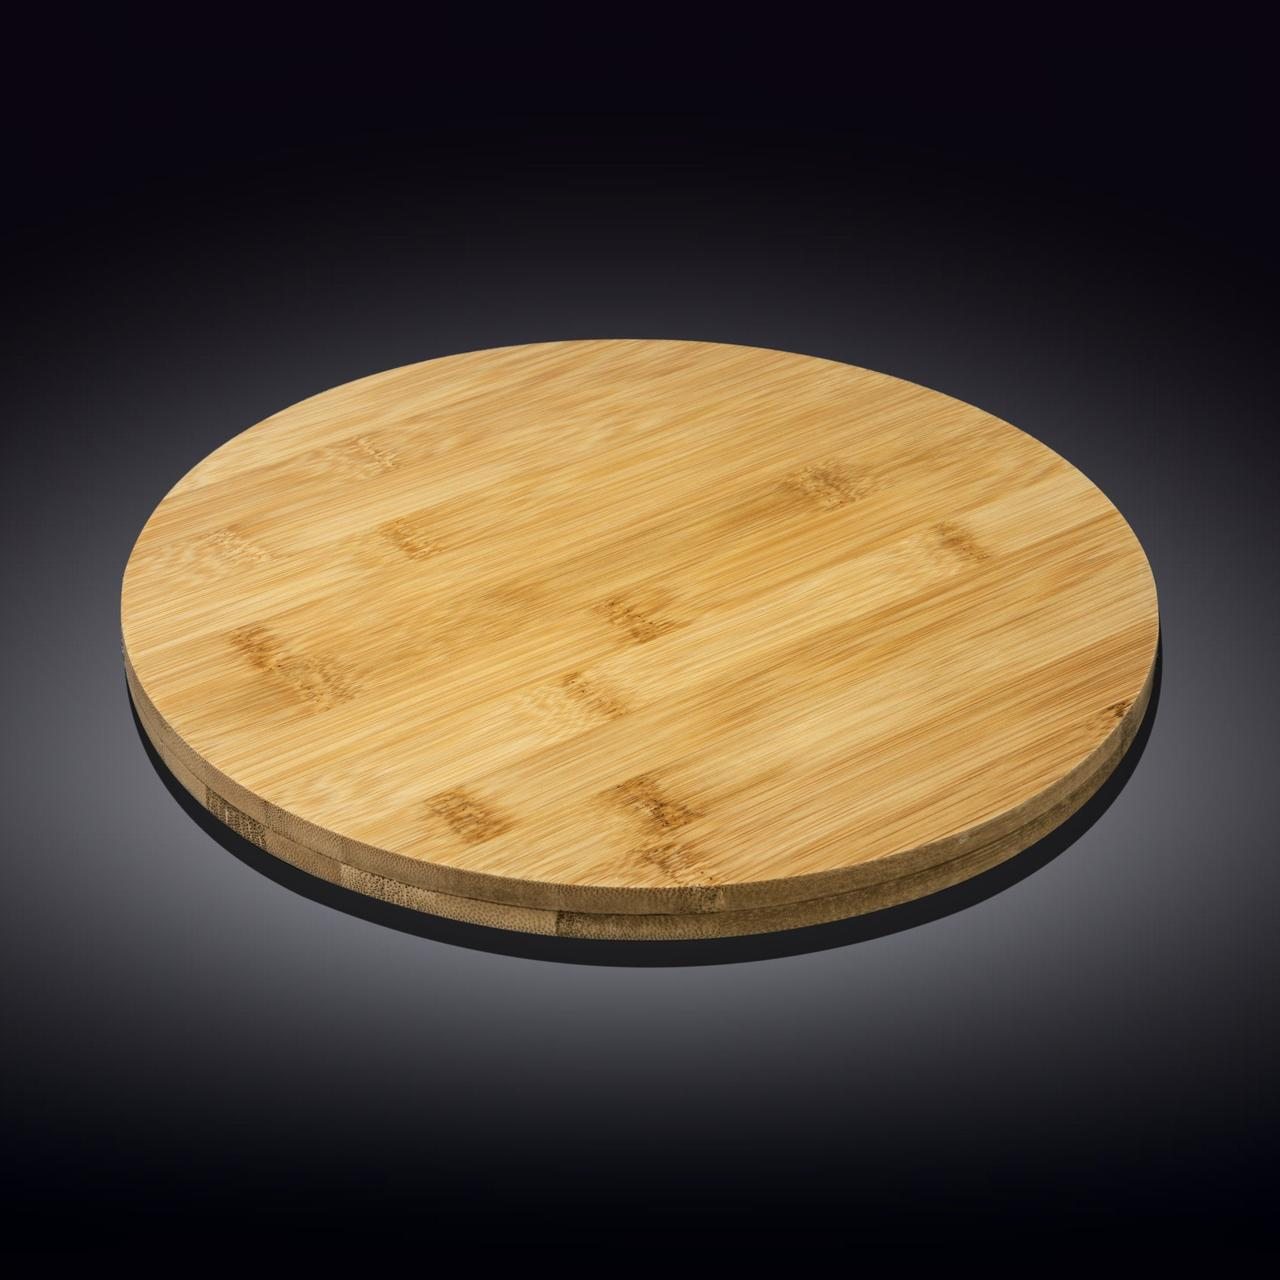 Блюдо кругле поворотное Wilmax WL-771079 30,5*4 см